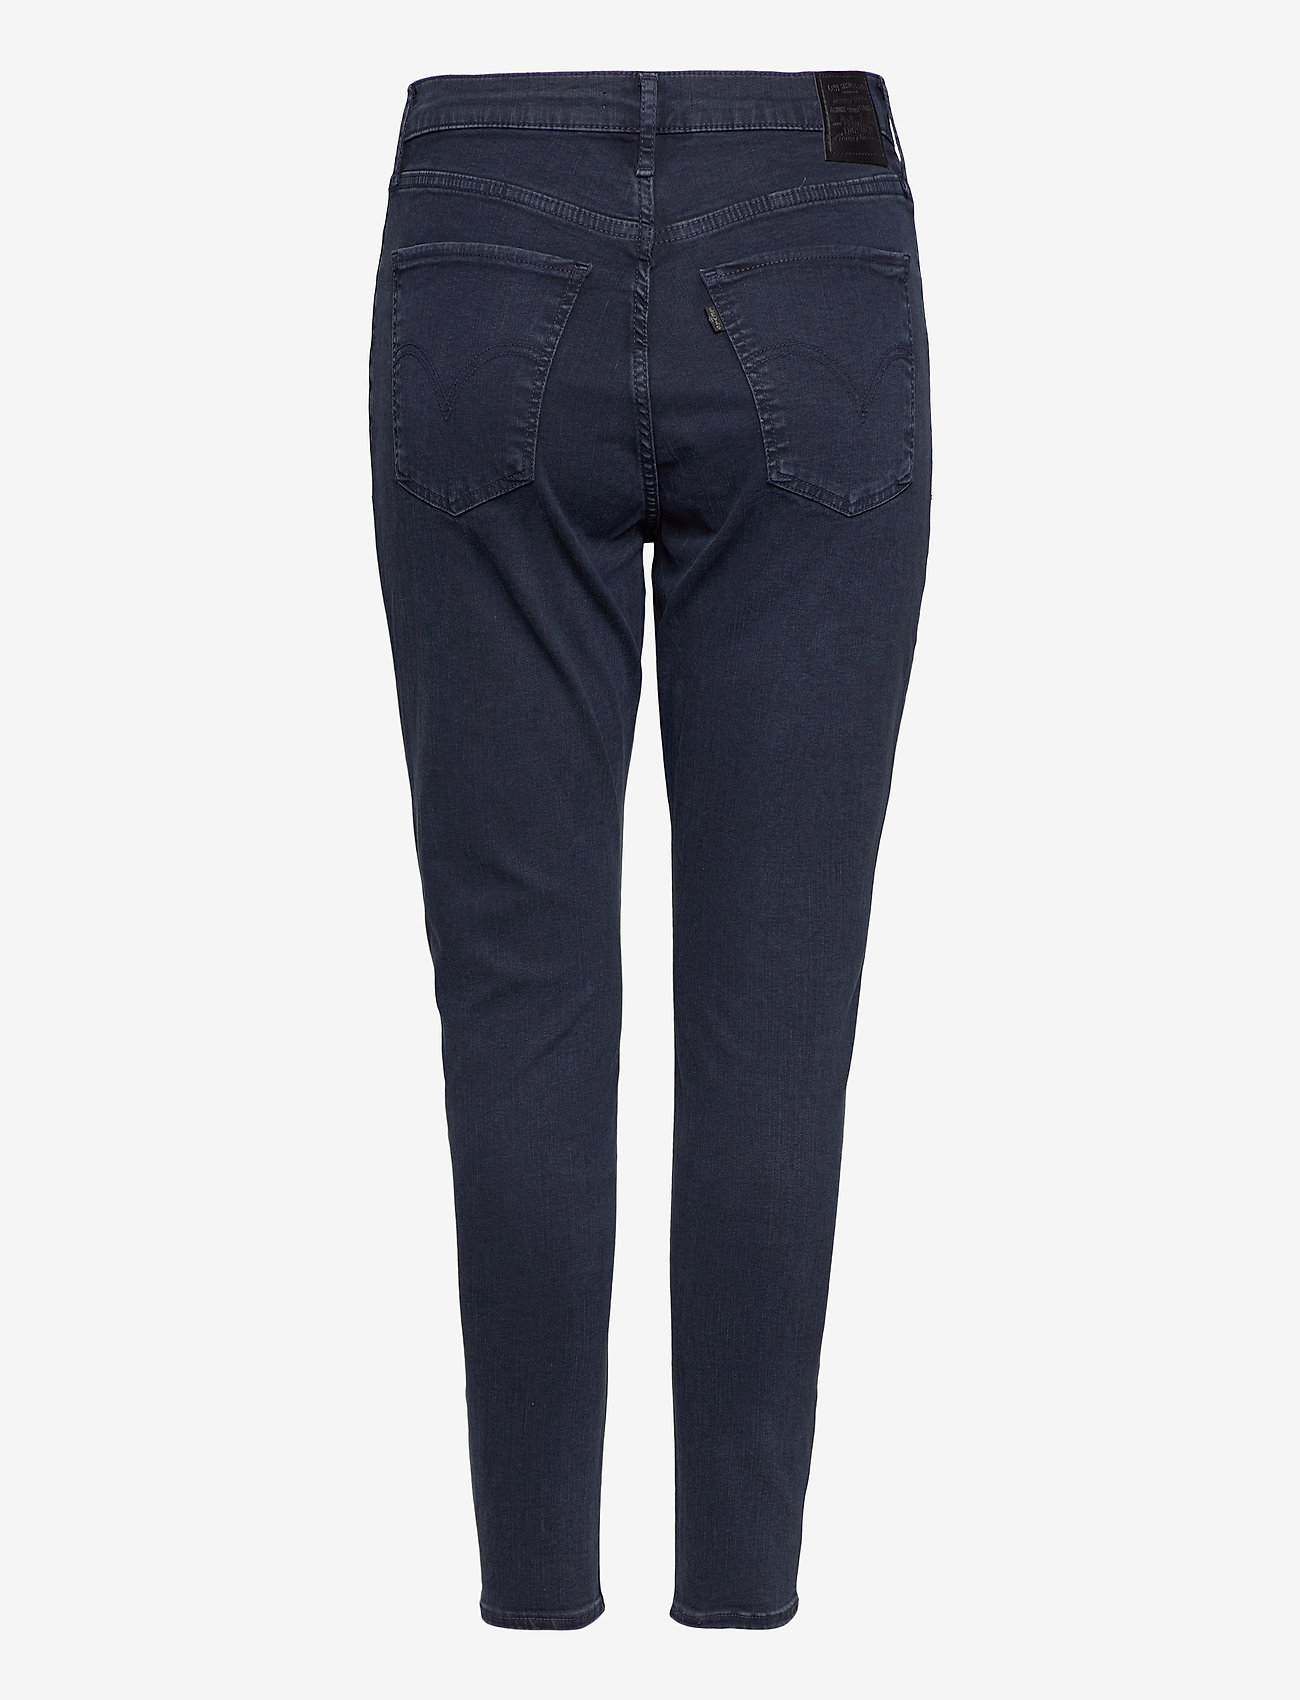 Levi's Plus Size - PLUS MILE HIGH SS BRUISED HEAR - skinny jeans - blacks - 1